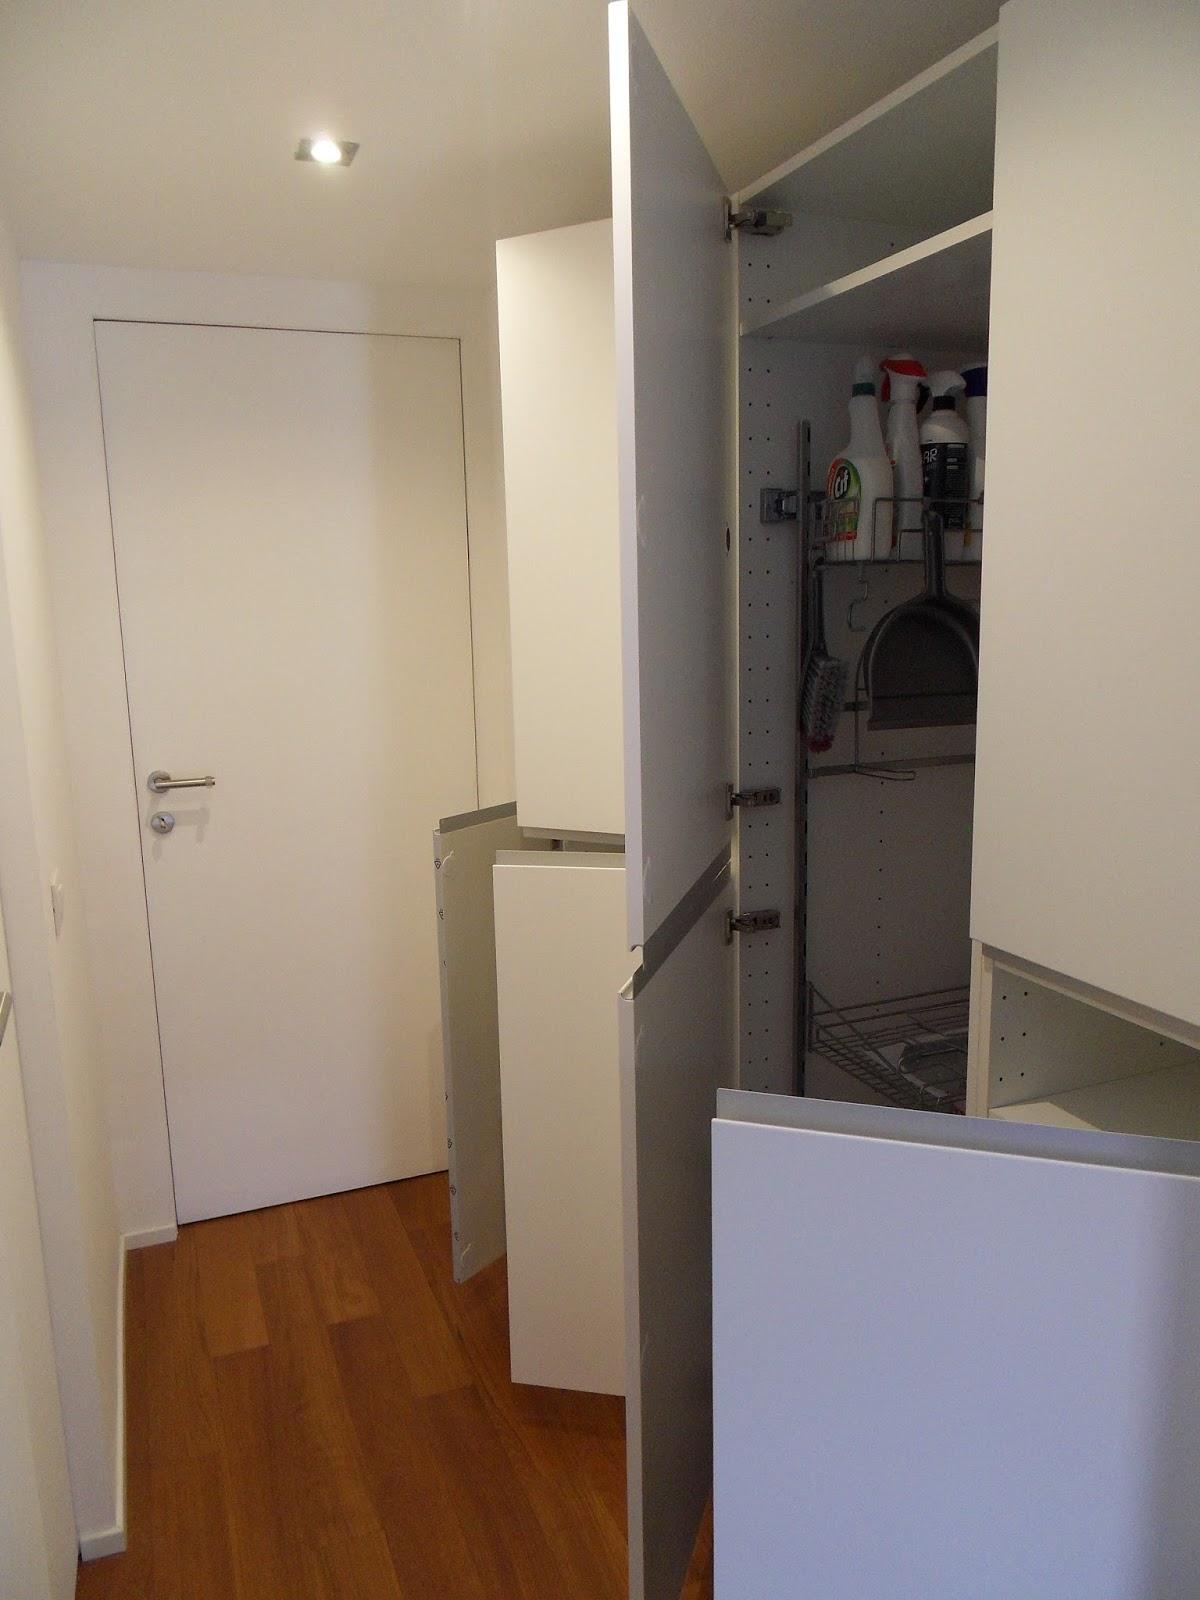 Mobili divisori bifacciali - Ikea mobili per lavanderia ...